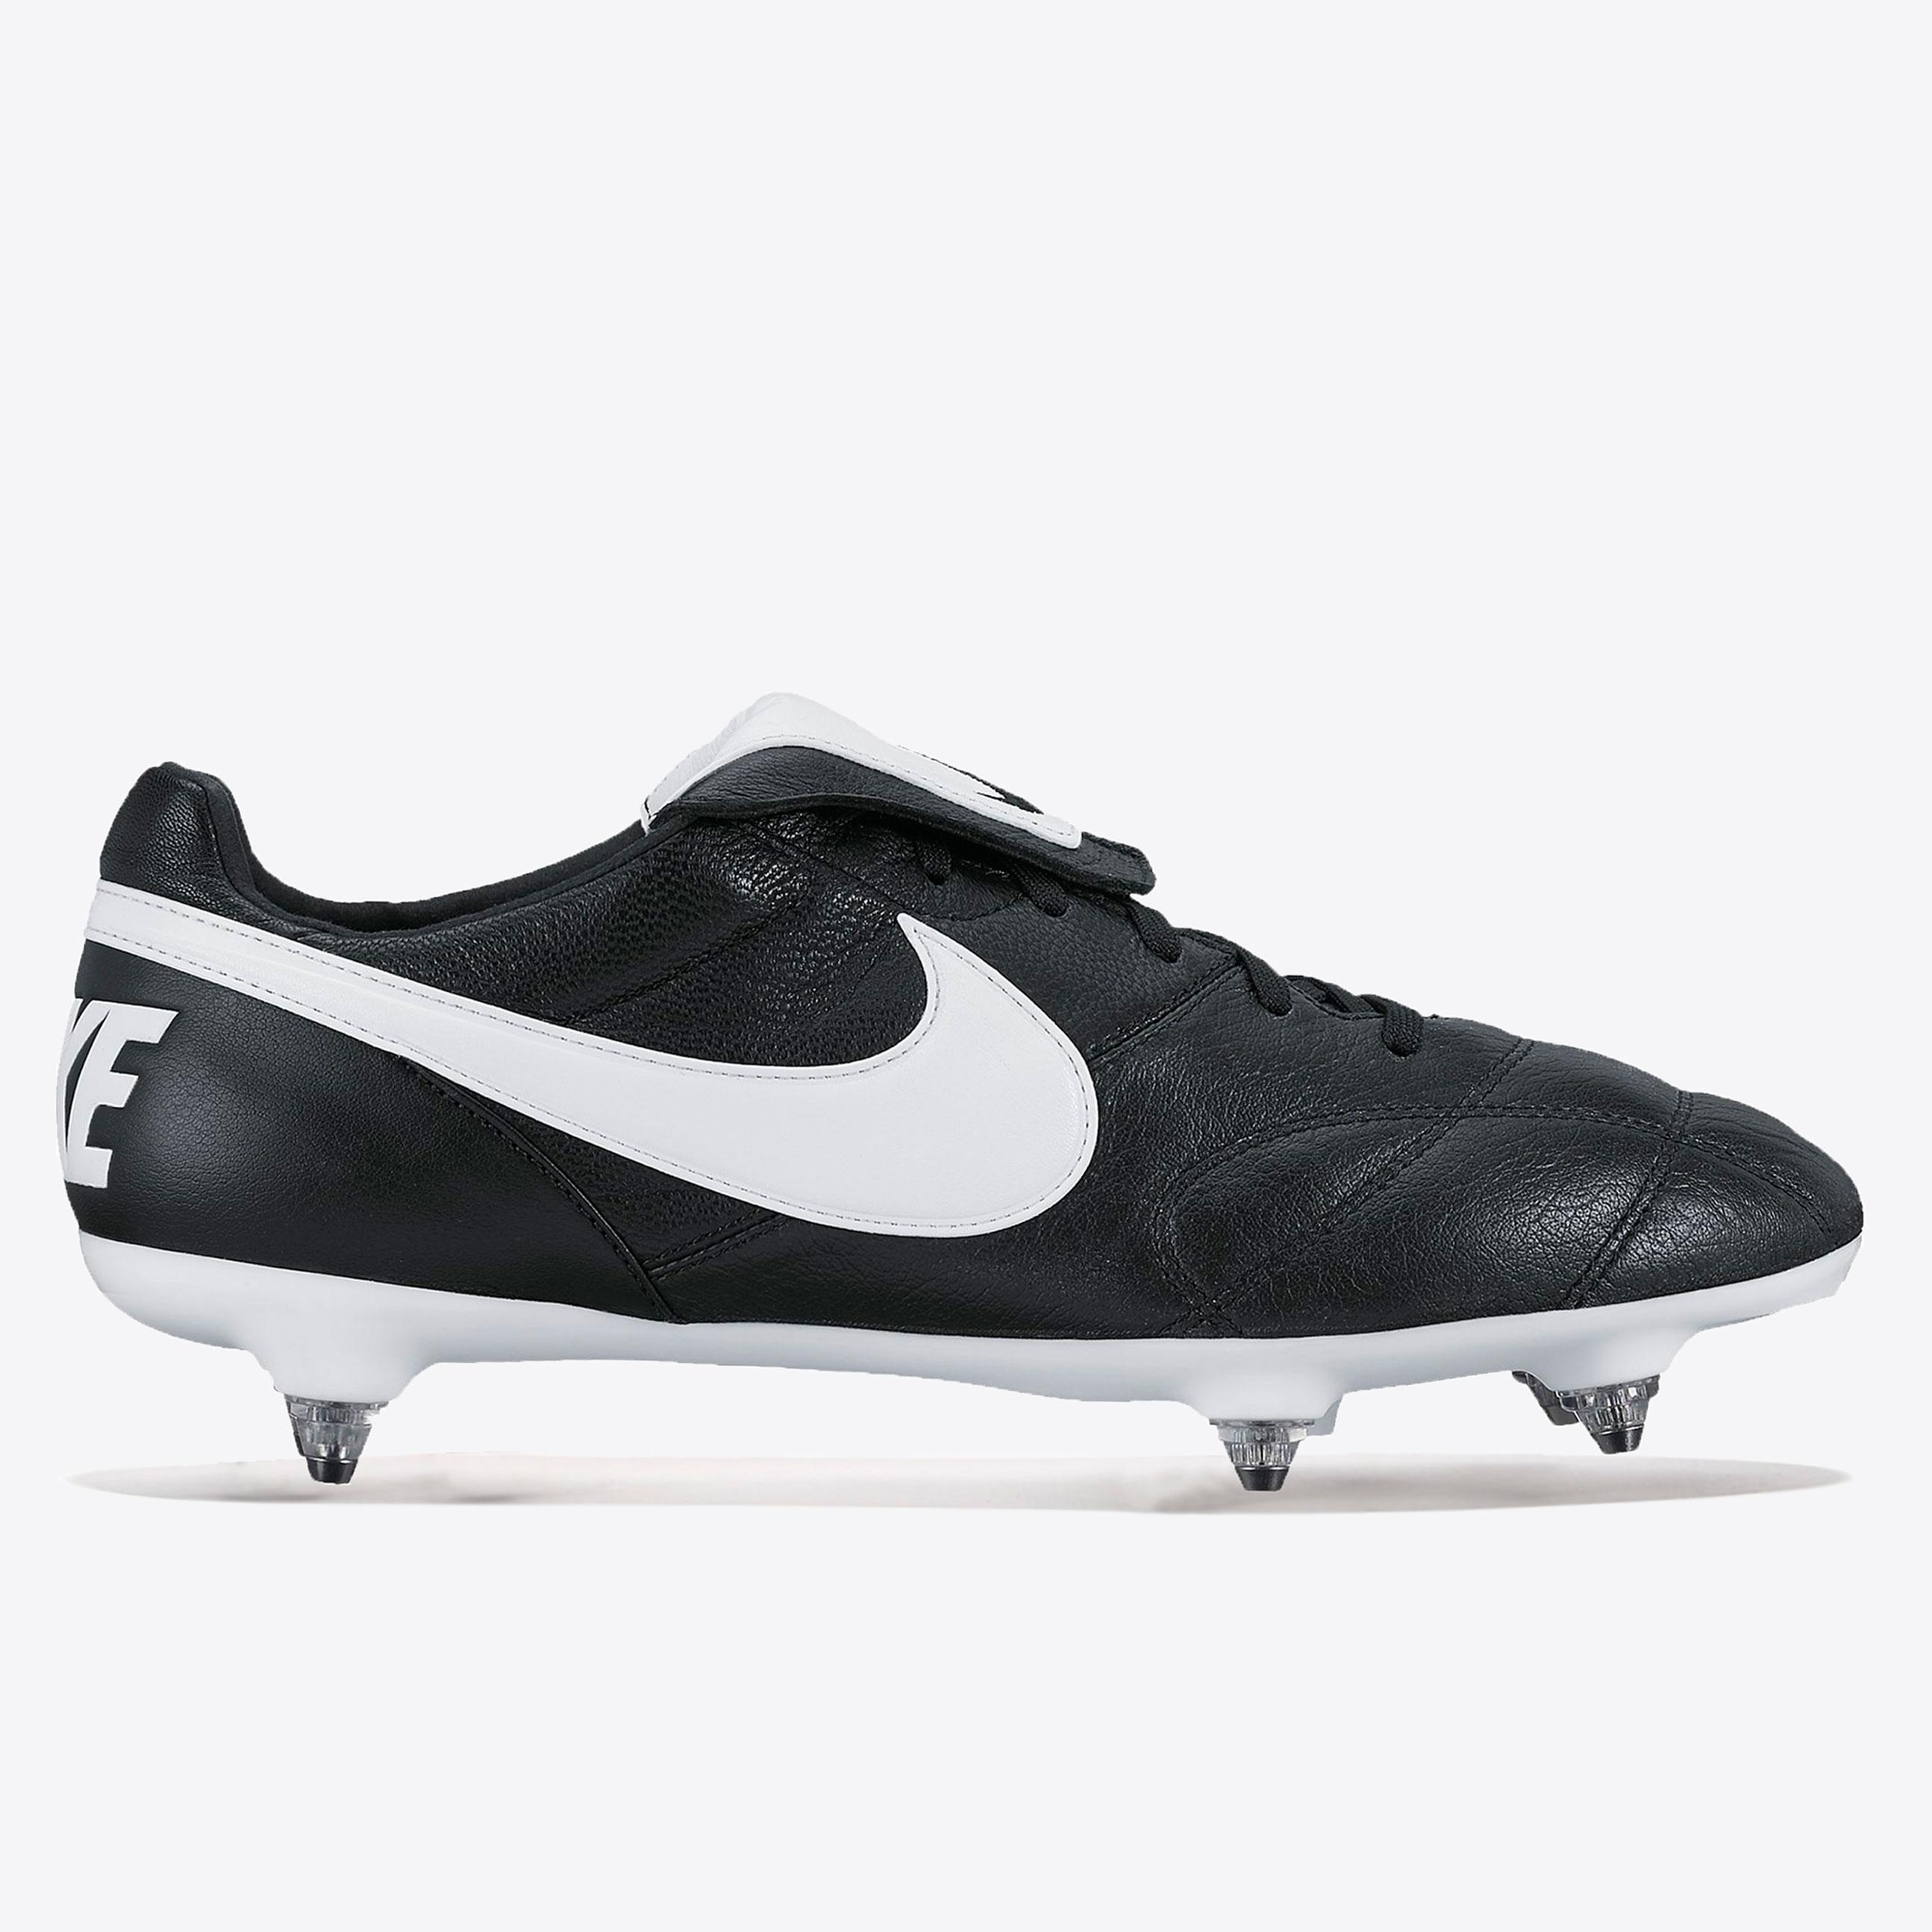 Nike Premier II Soft Ground Football Boots - Black/White/Black